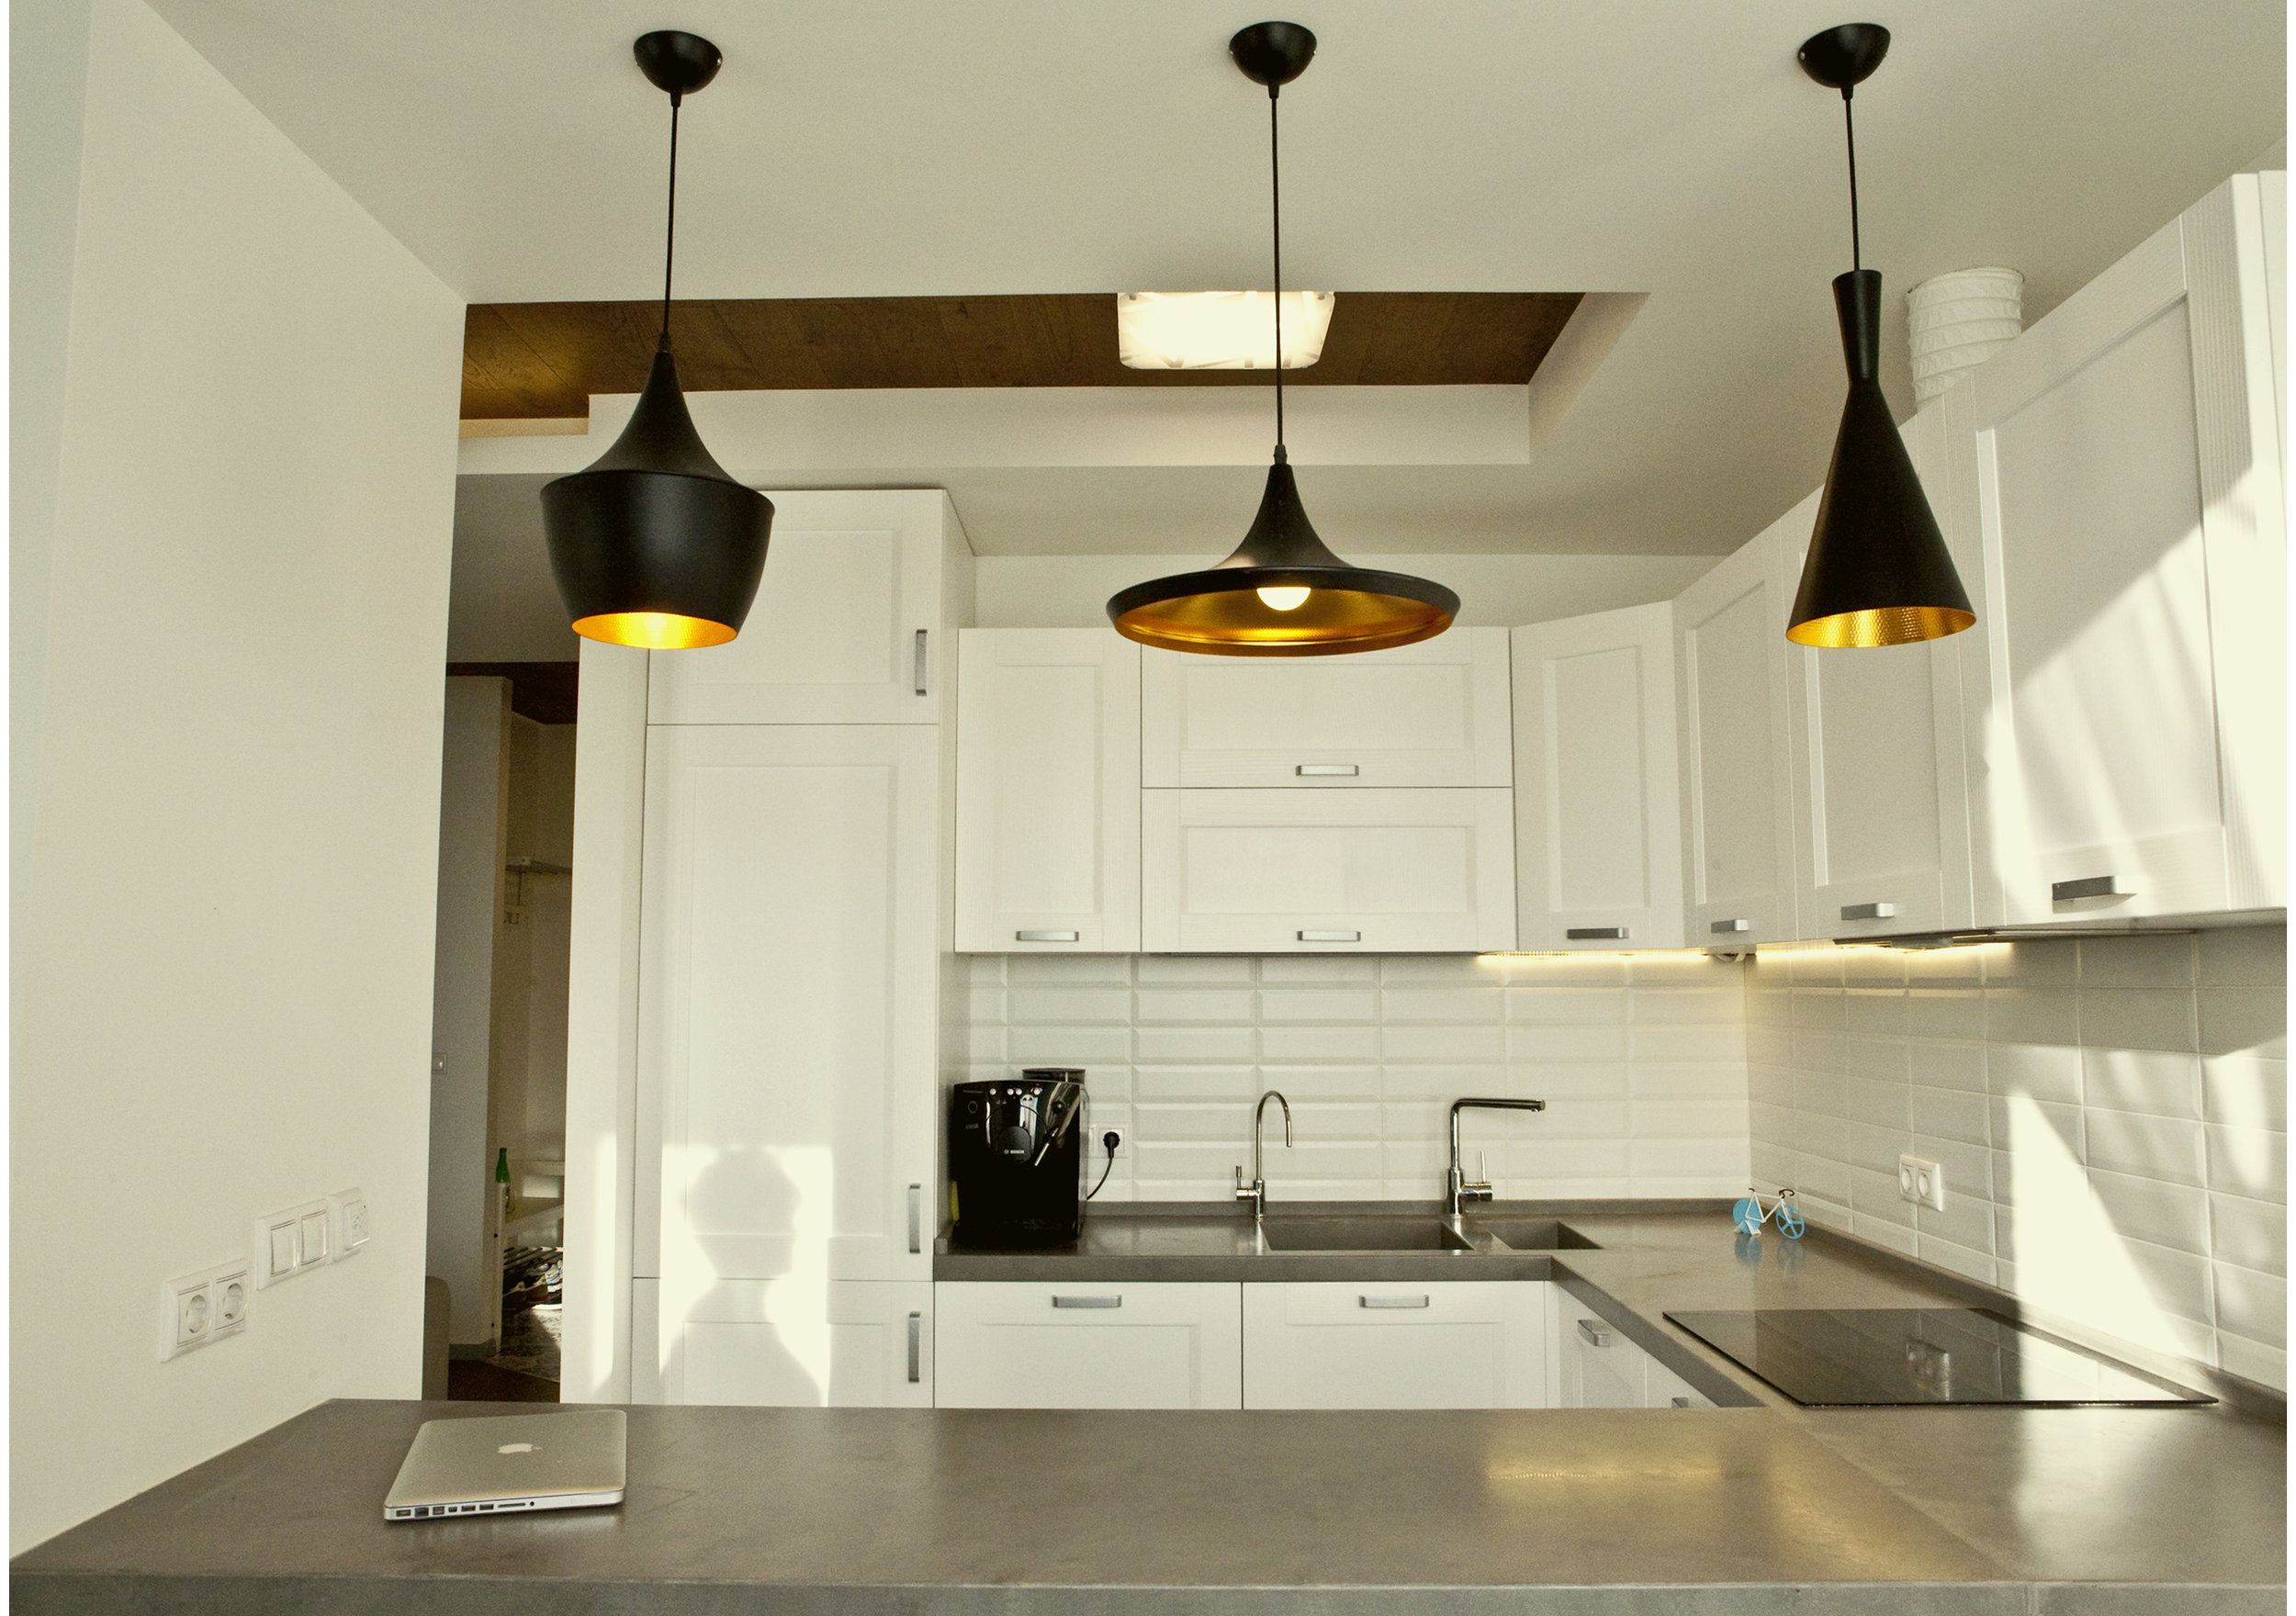 Copy of Contemporary L-shaped kitchen interior